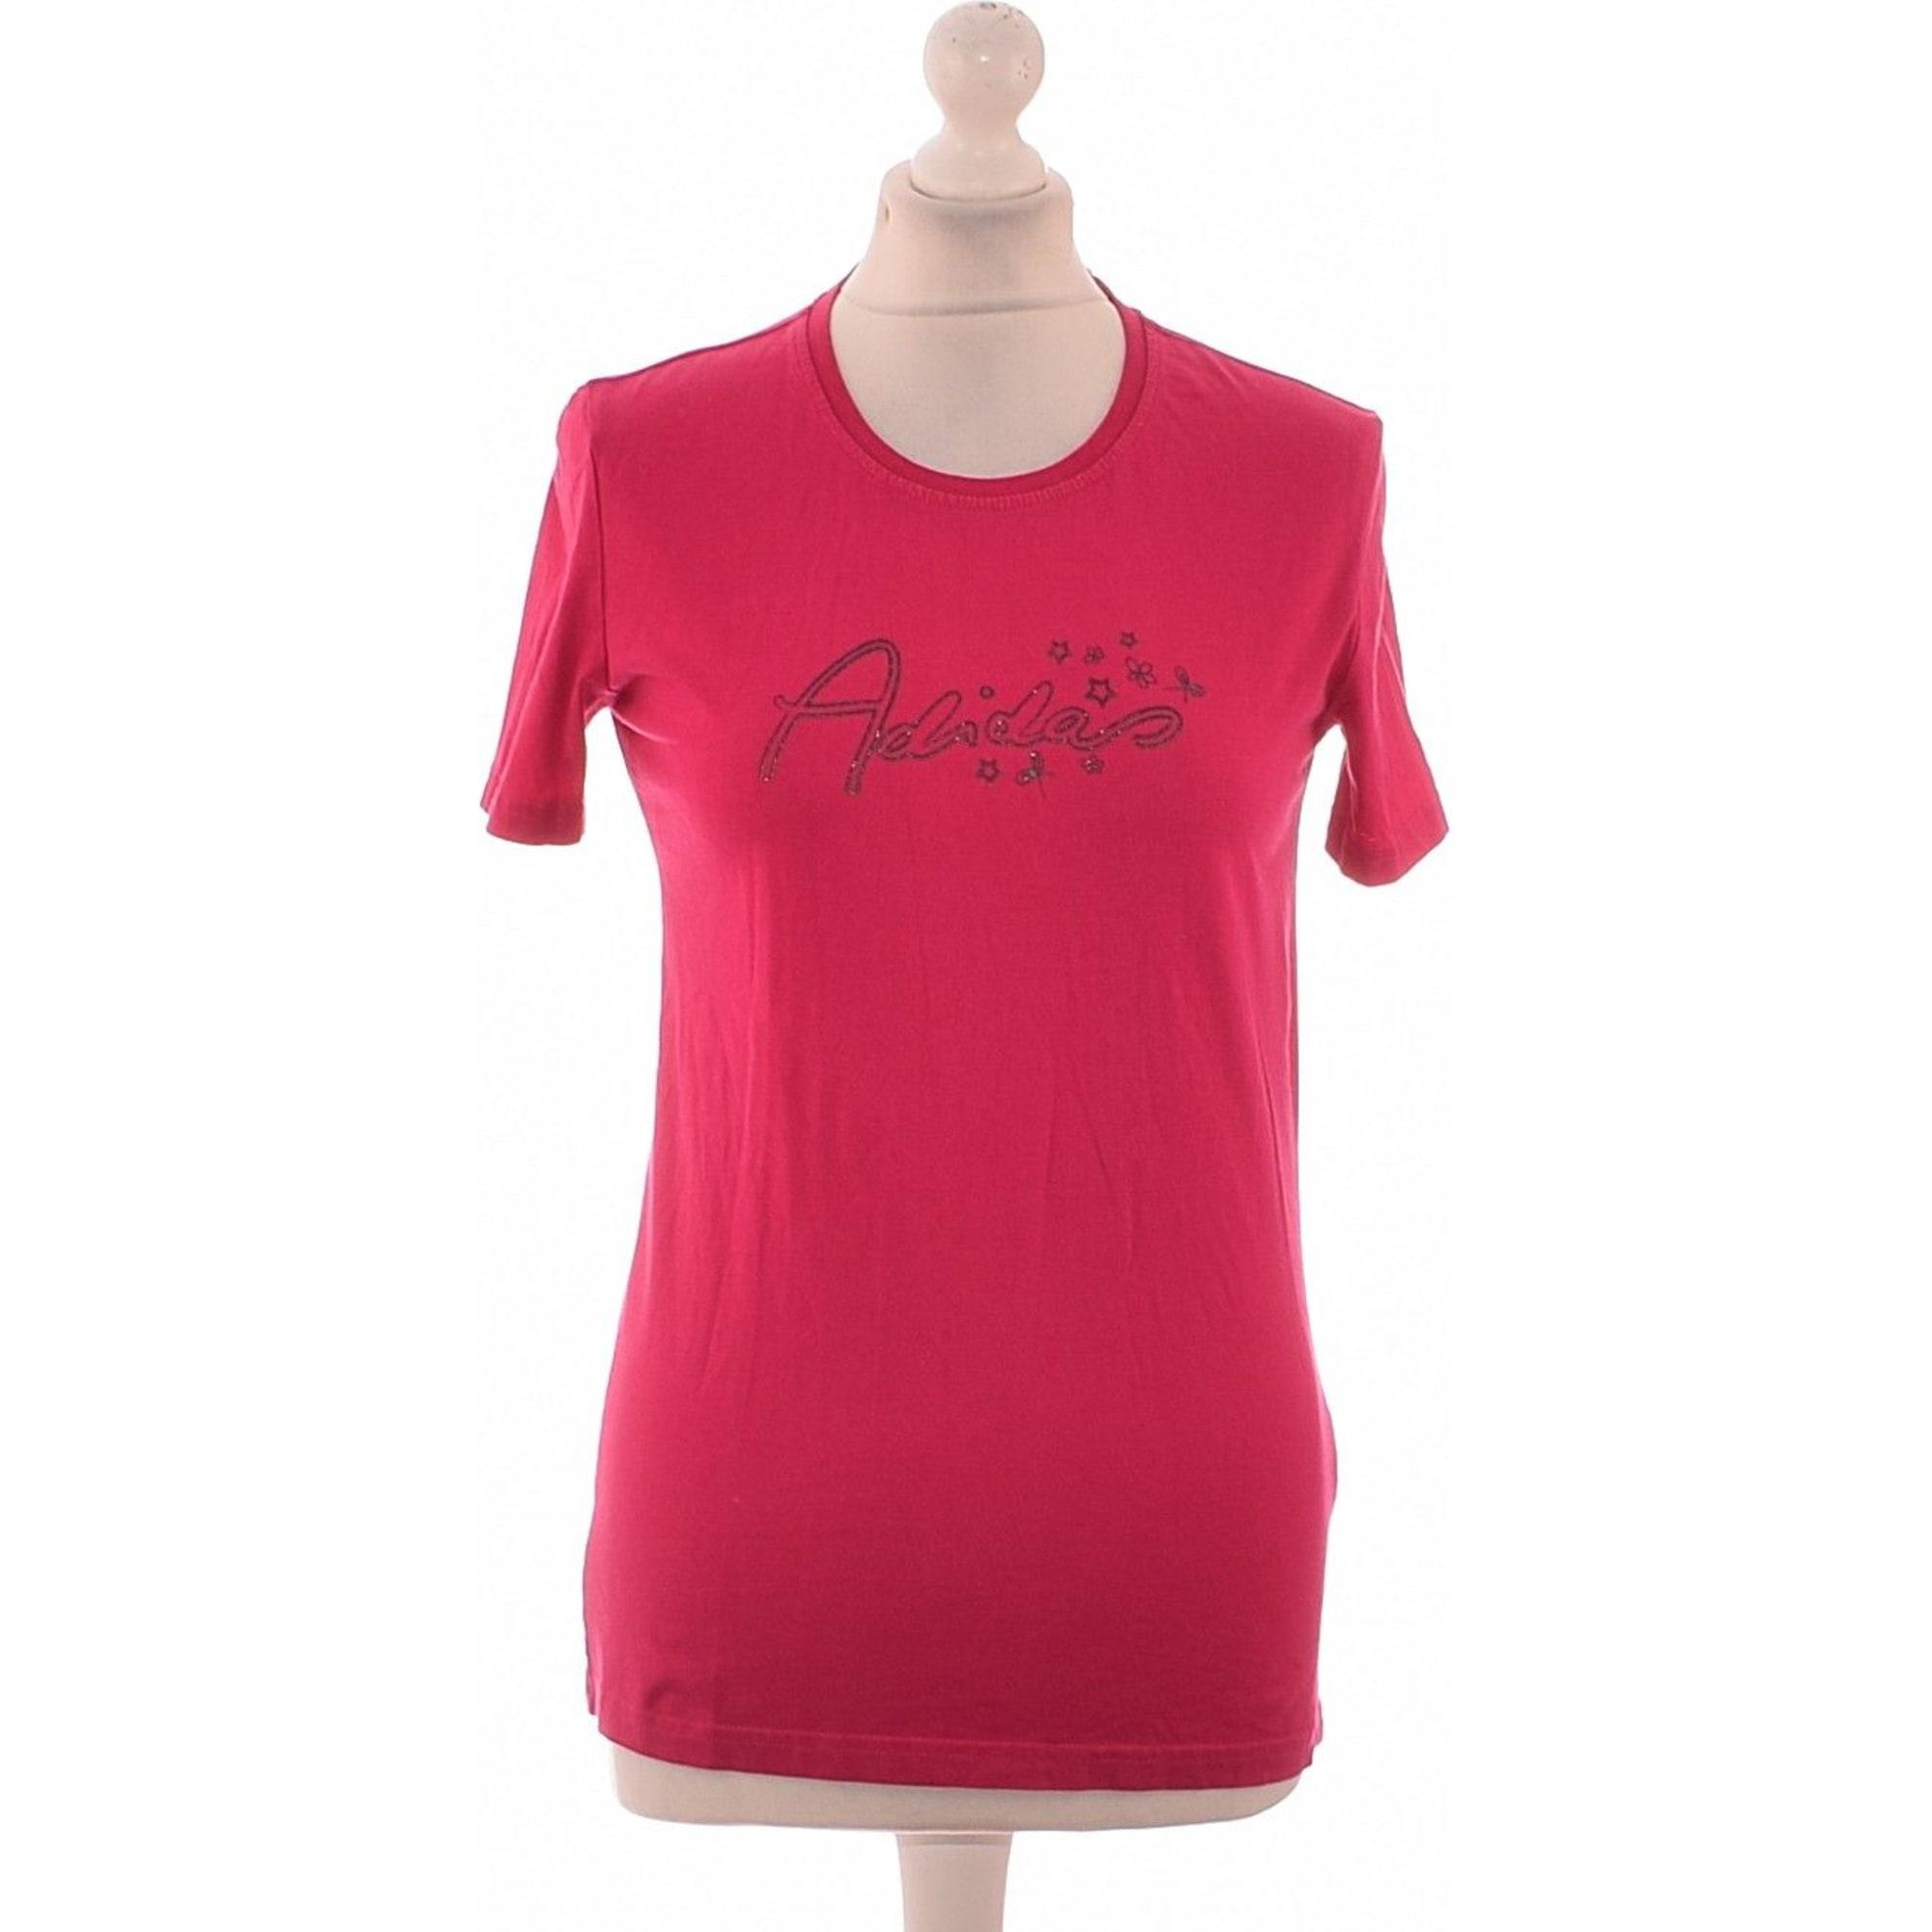 Top, t-shirt ADIDAS Rosa, fucsia, rosa antico